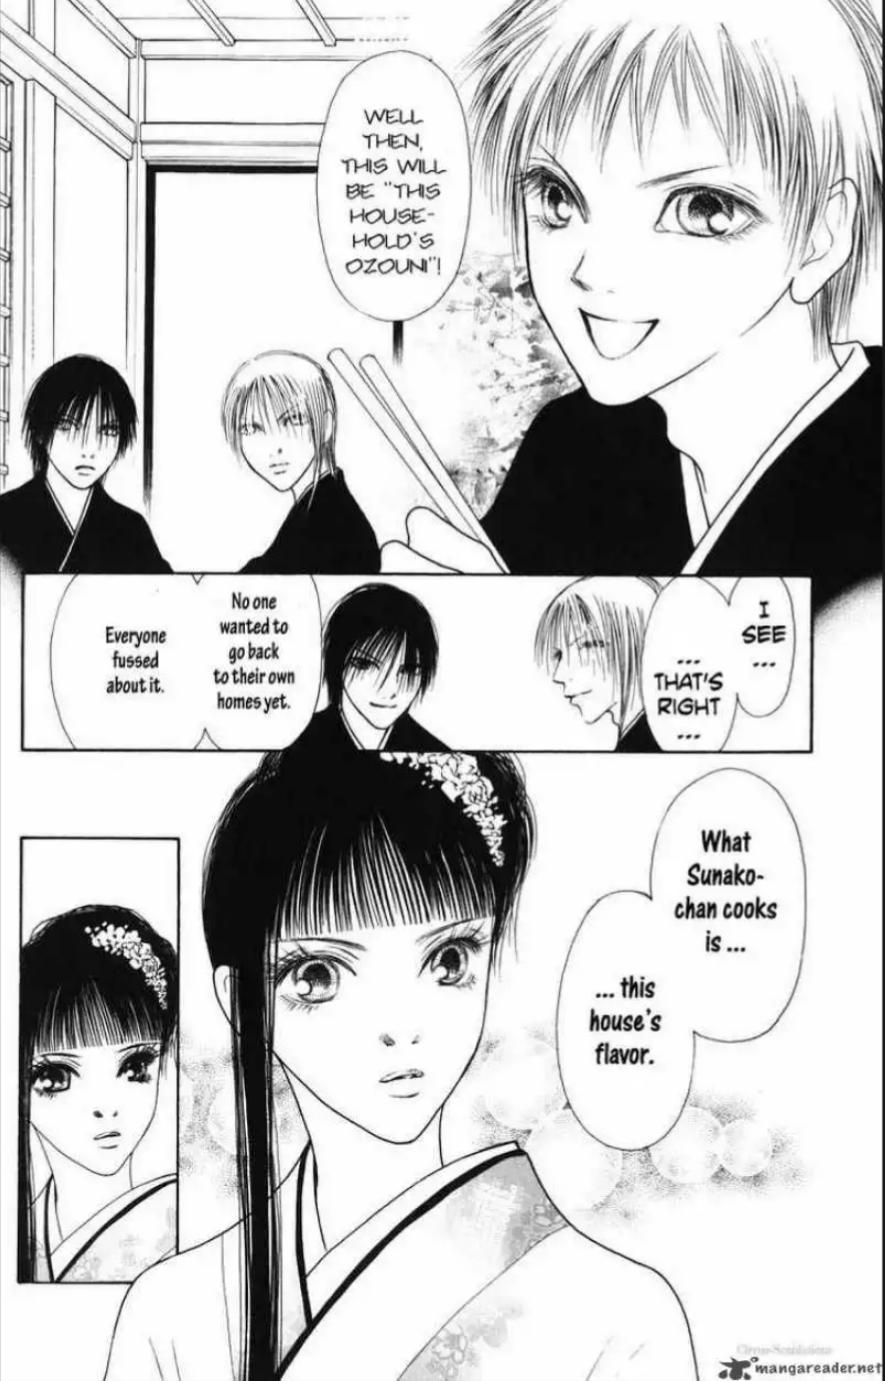 Perfect Girl Evolution Manga Sunako Nakahara  E3 83 A4 E3 83 9e E3 83 88 E3 83 8a E3 83 87 E3 82 B7 E3 82 B3 E4 B8 83 E5 A4 89 E5 8c 96 Yamato Nadeshiko Shichi Henge The Wallflower Flavor